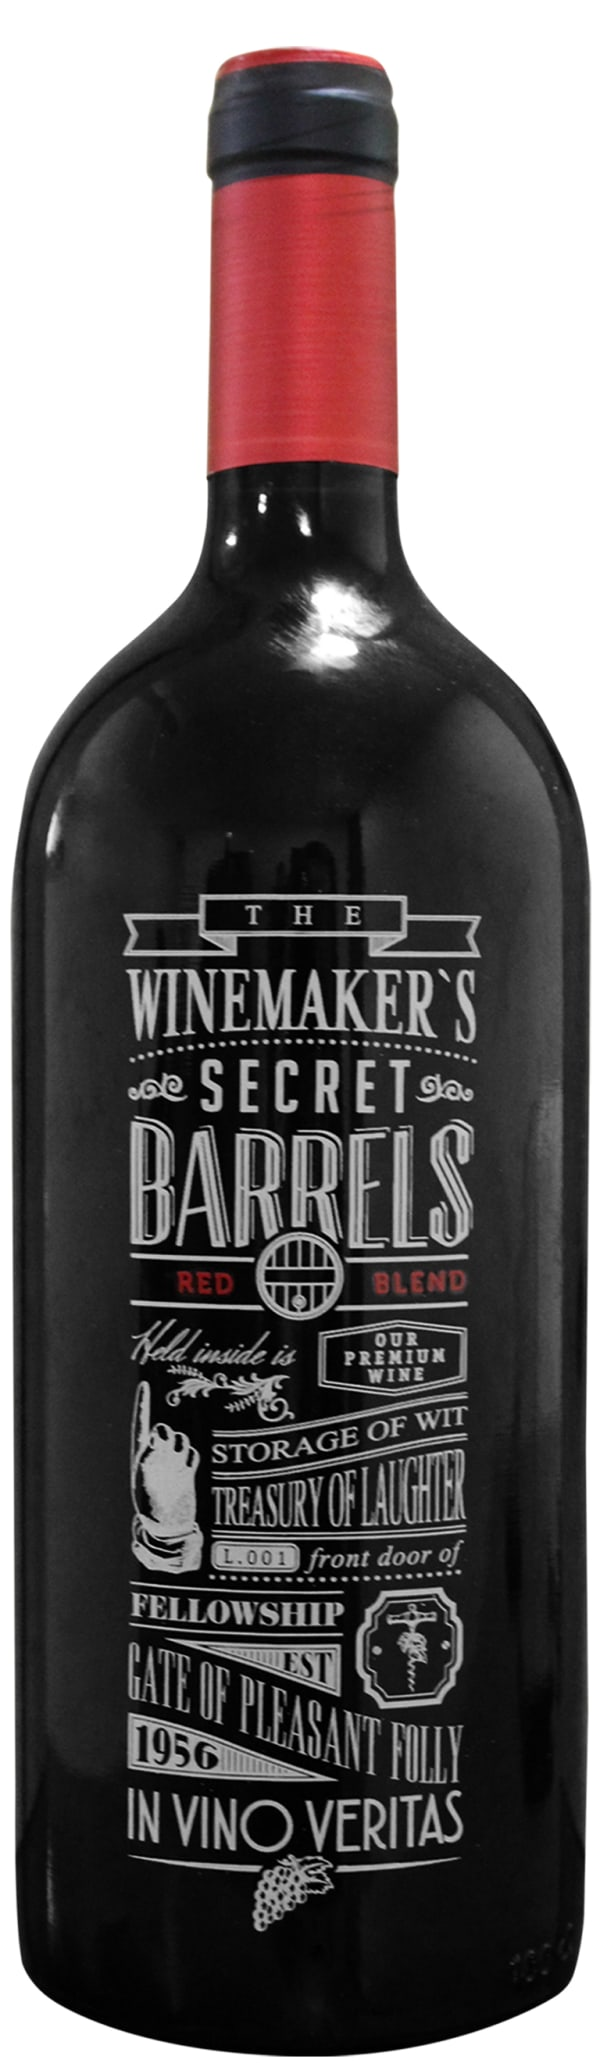 The Winemaker's Secret Barrels